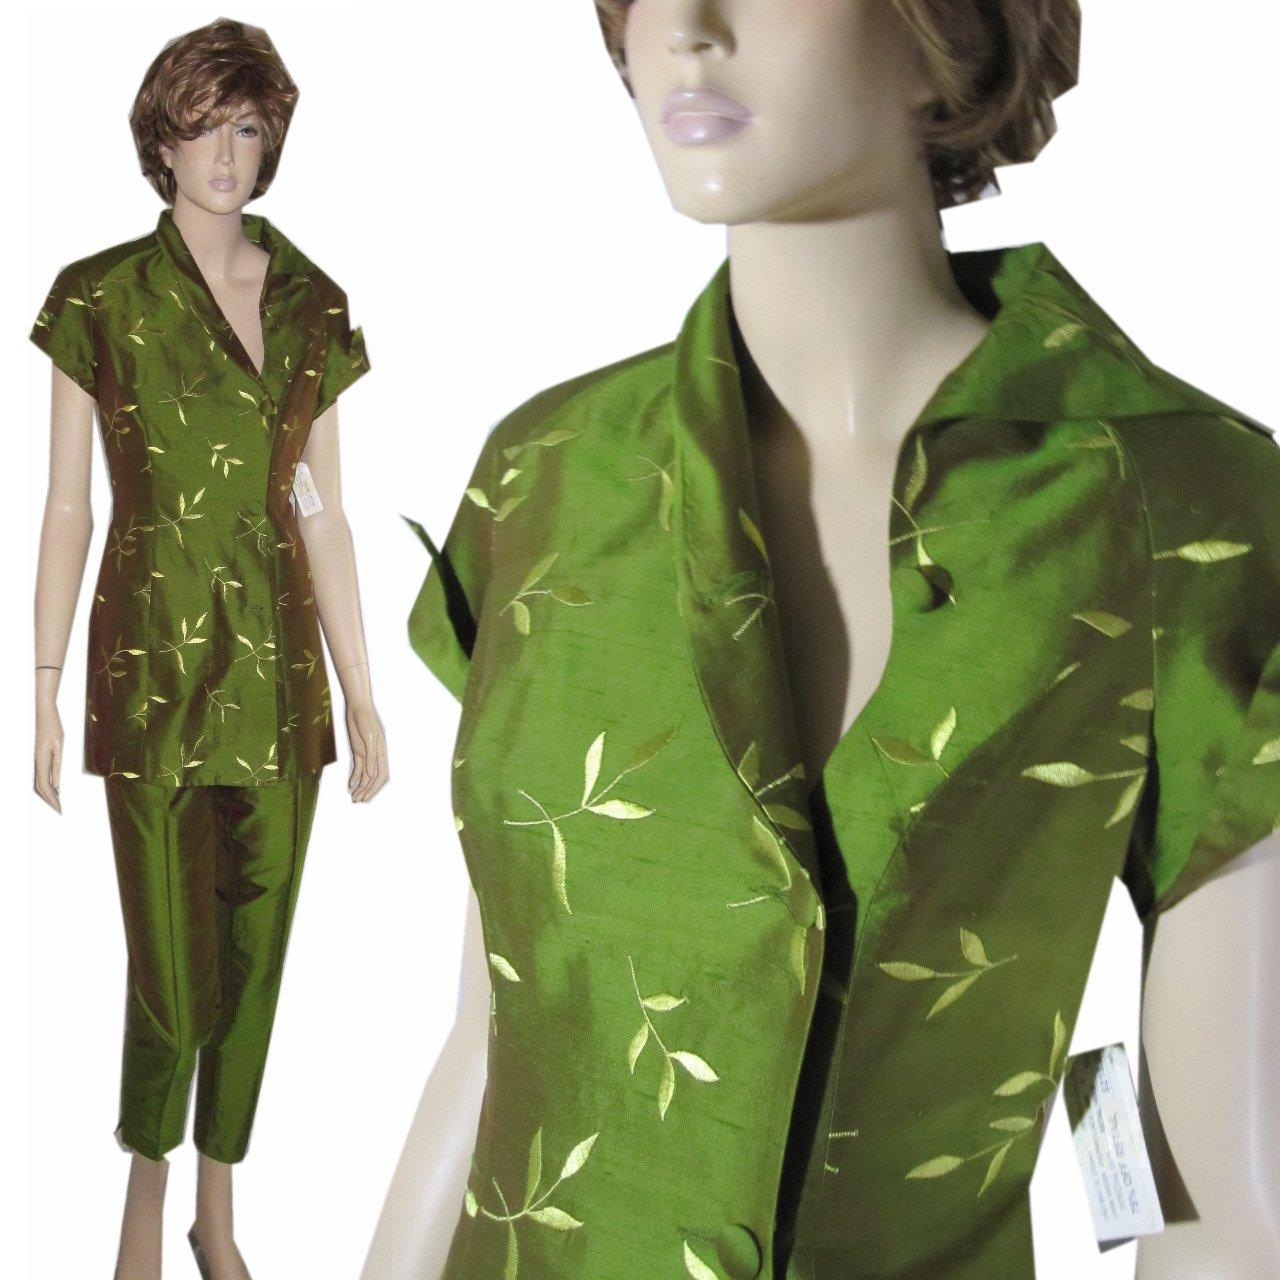 sz 6 PETROVITCH & ROBINSON Paris Silk Pant Suit $99 - LIst Price $870